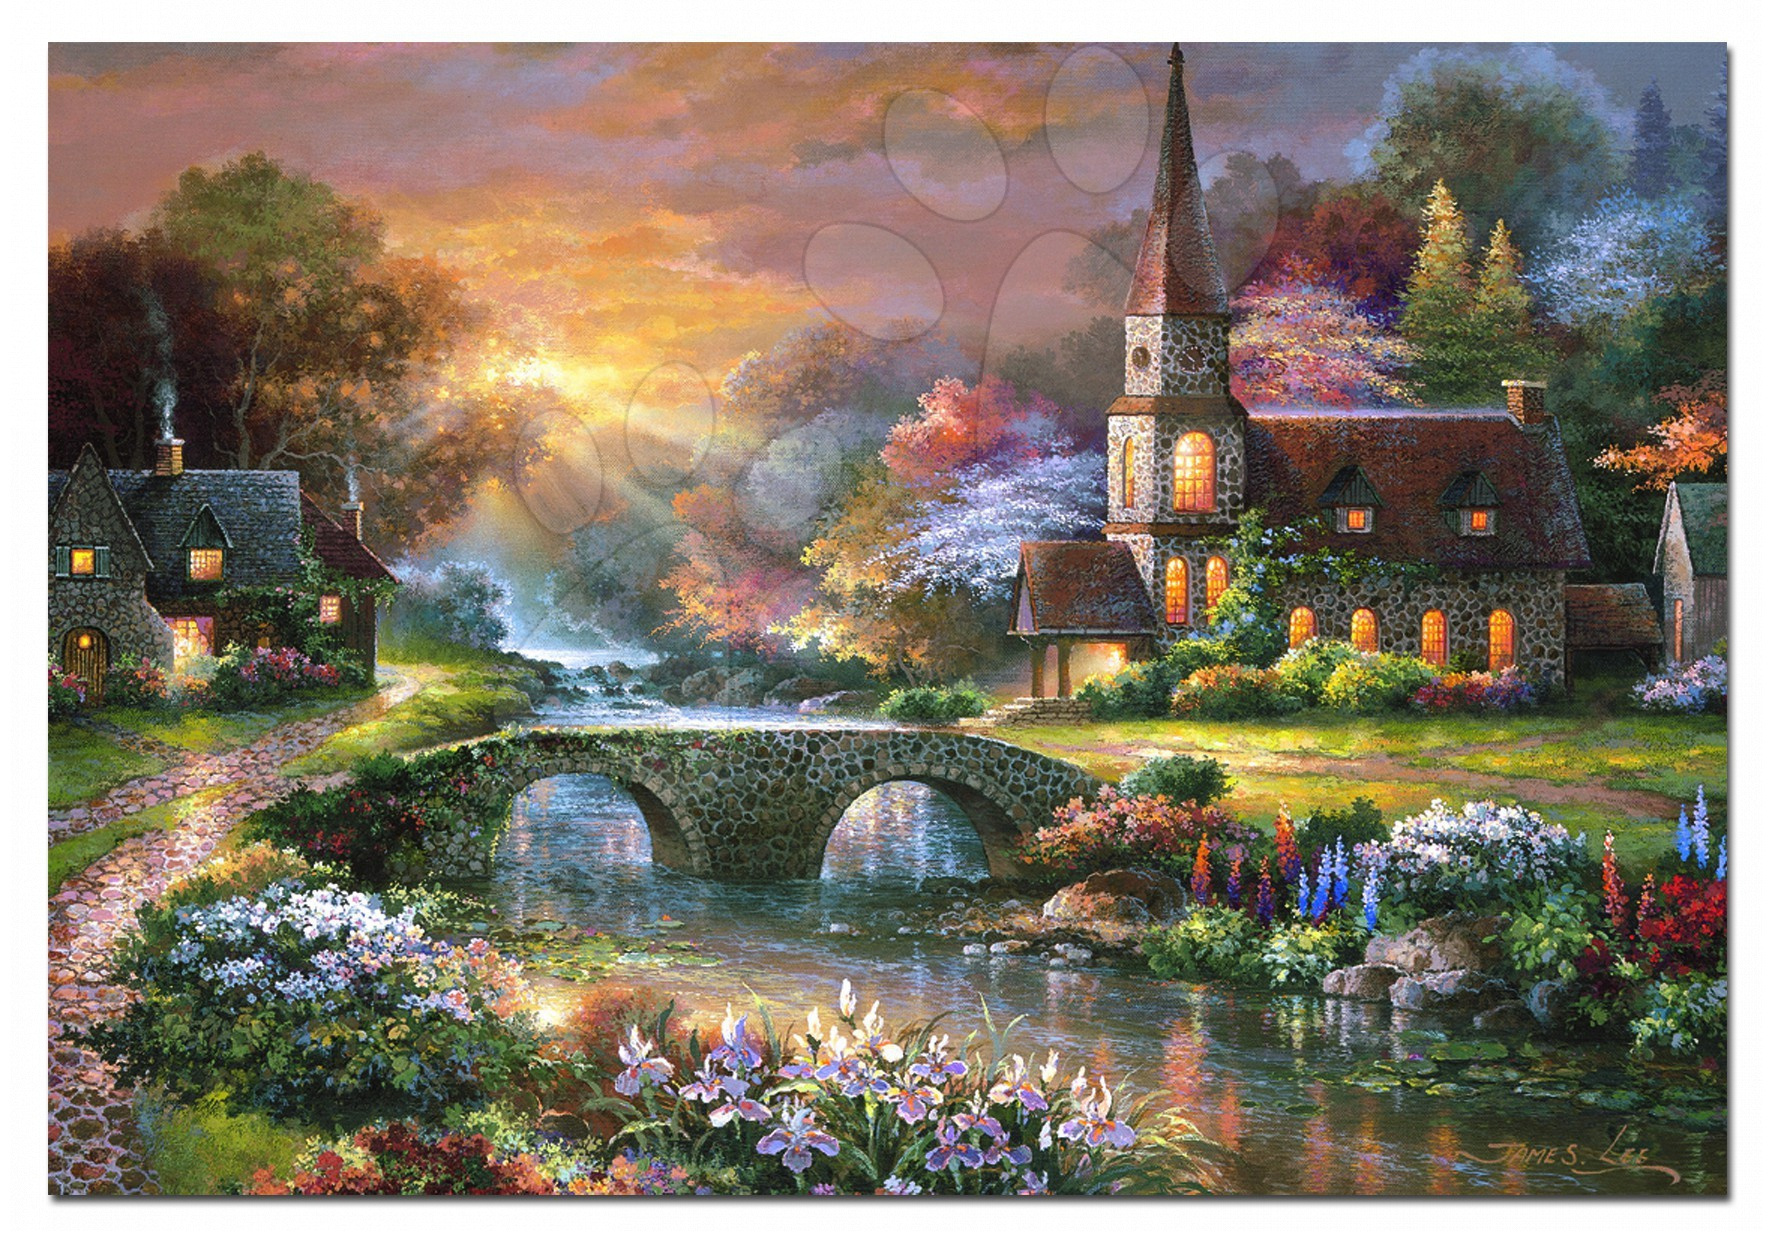 1000 darabos puzzle - Puzzle - James Lee, Peaceful reflections Educa 1000 db + Fix Puzzle ragasztó